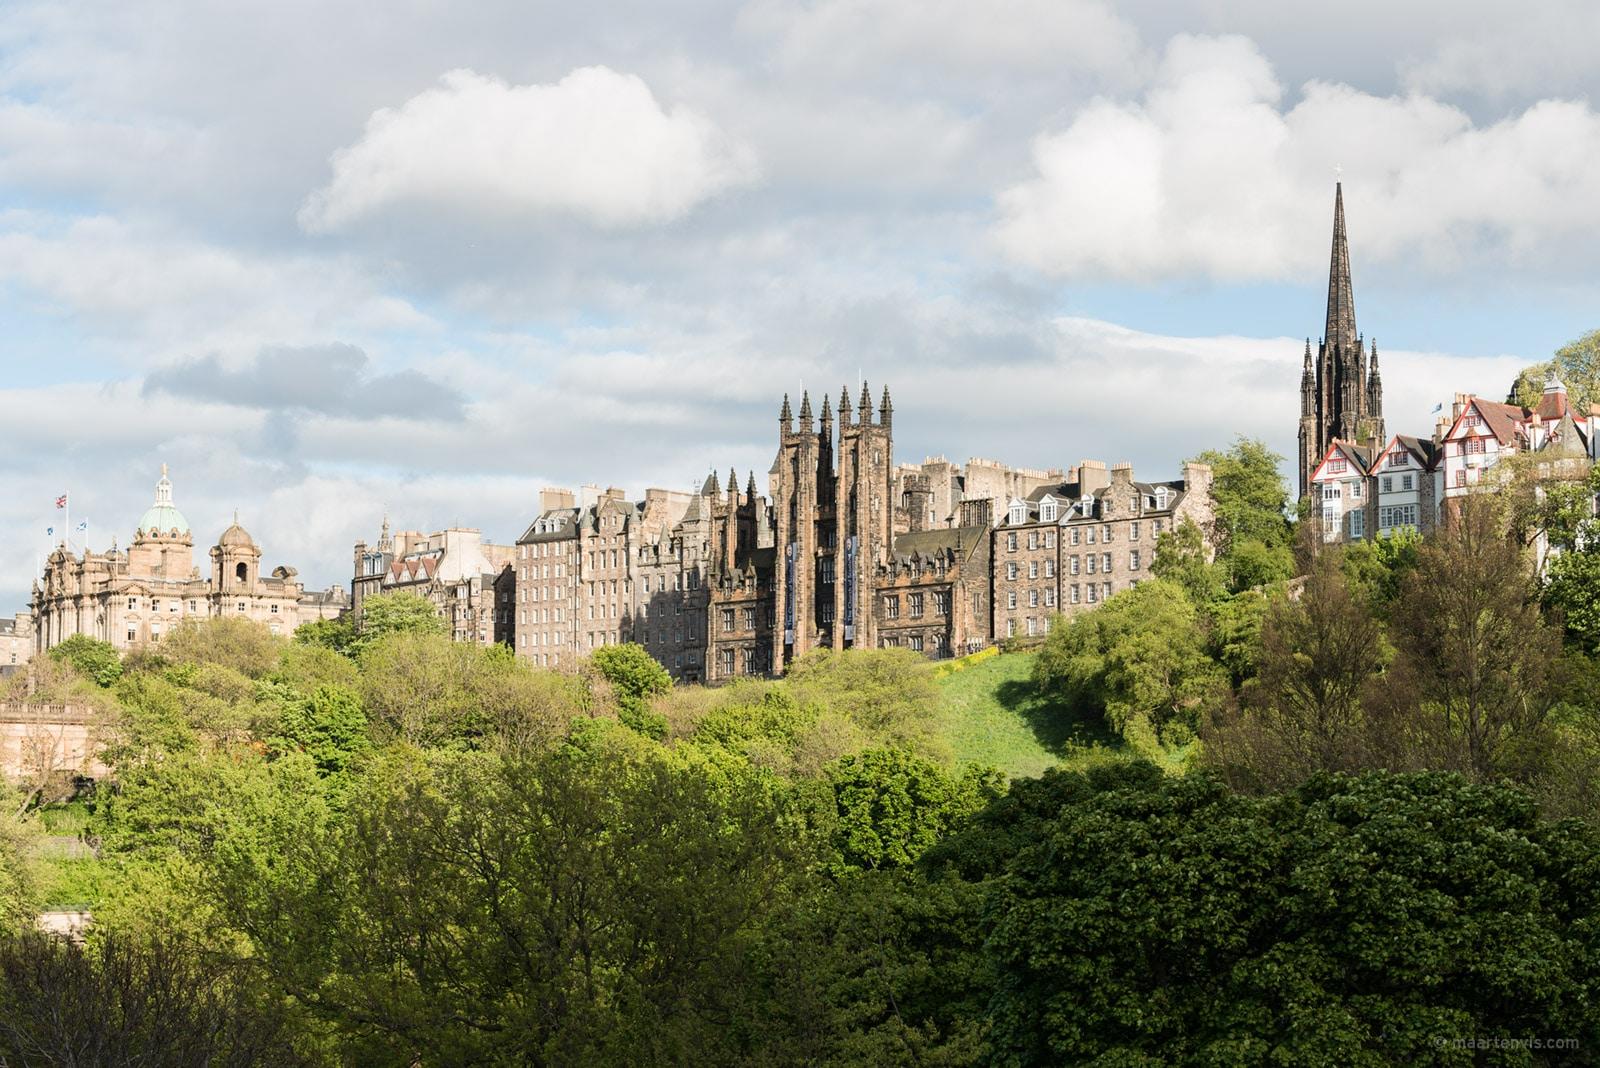 20150523 8765 - Enjoying Edinburgh